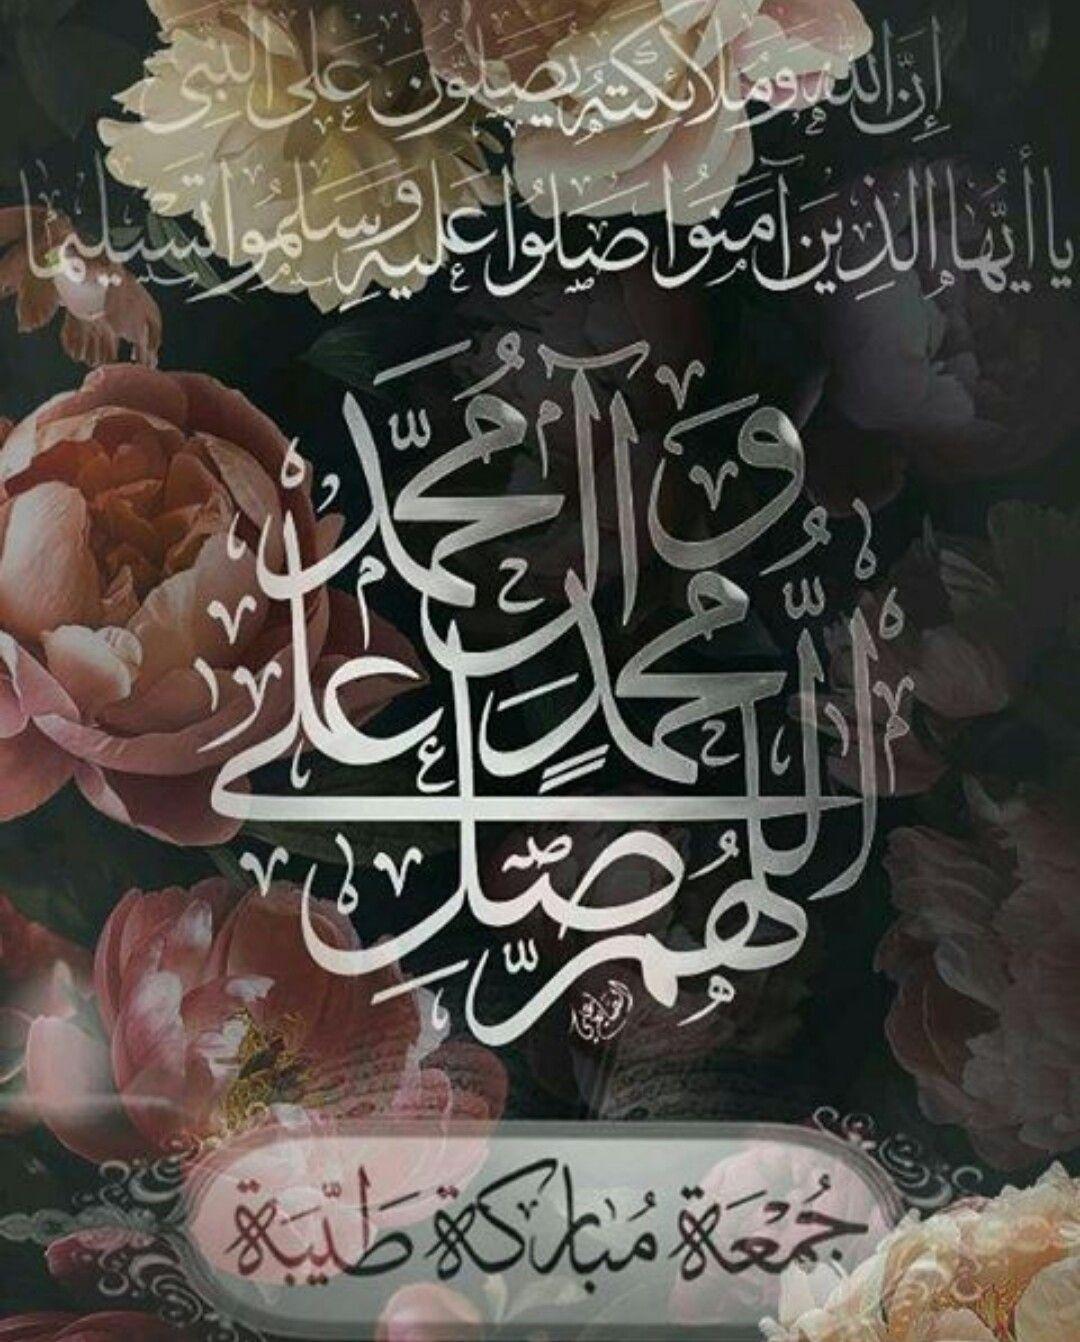 اللهم صل على محمد وال محمد Islamic Art Calligraphy Islamic Images Islamic Caligraphy